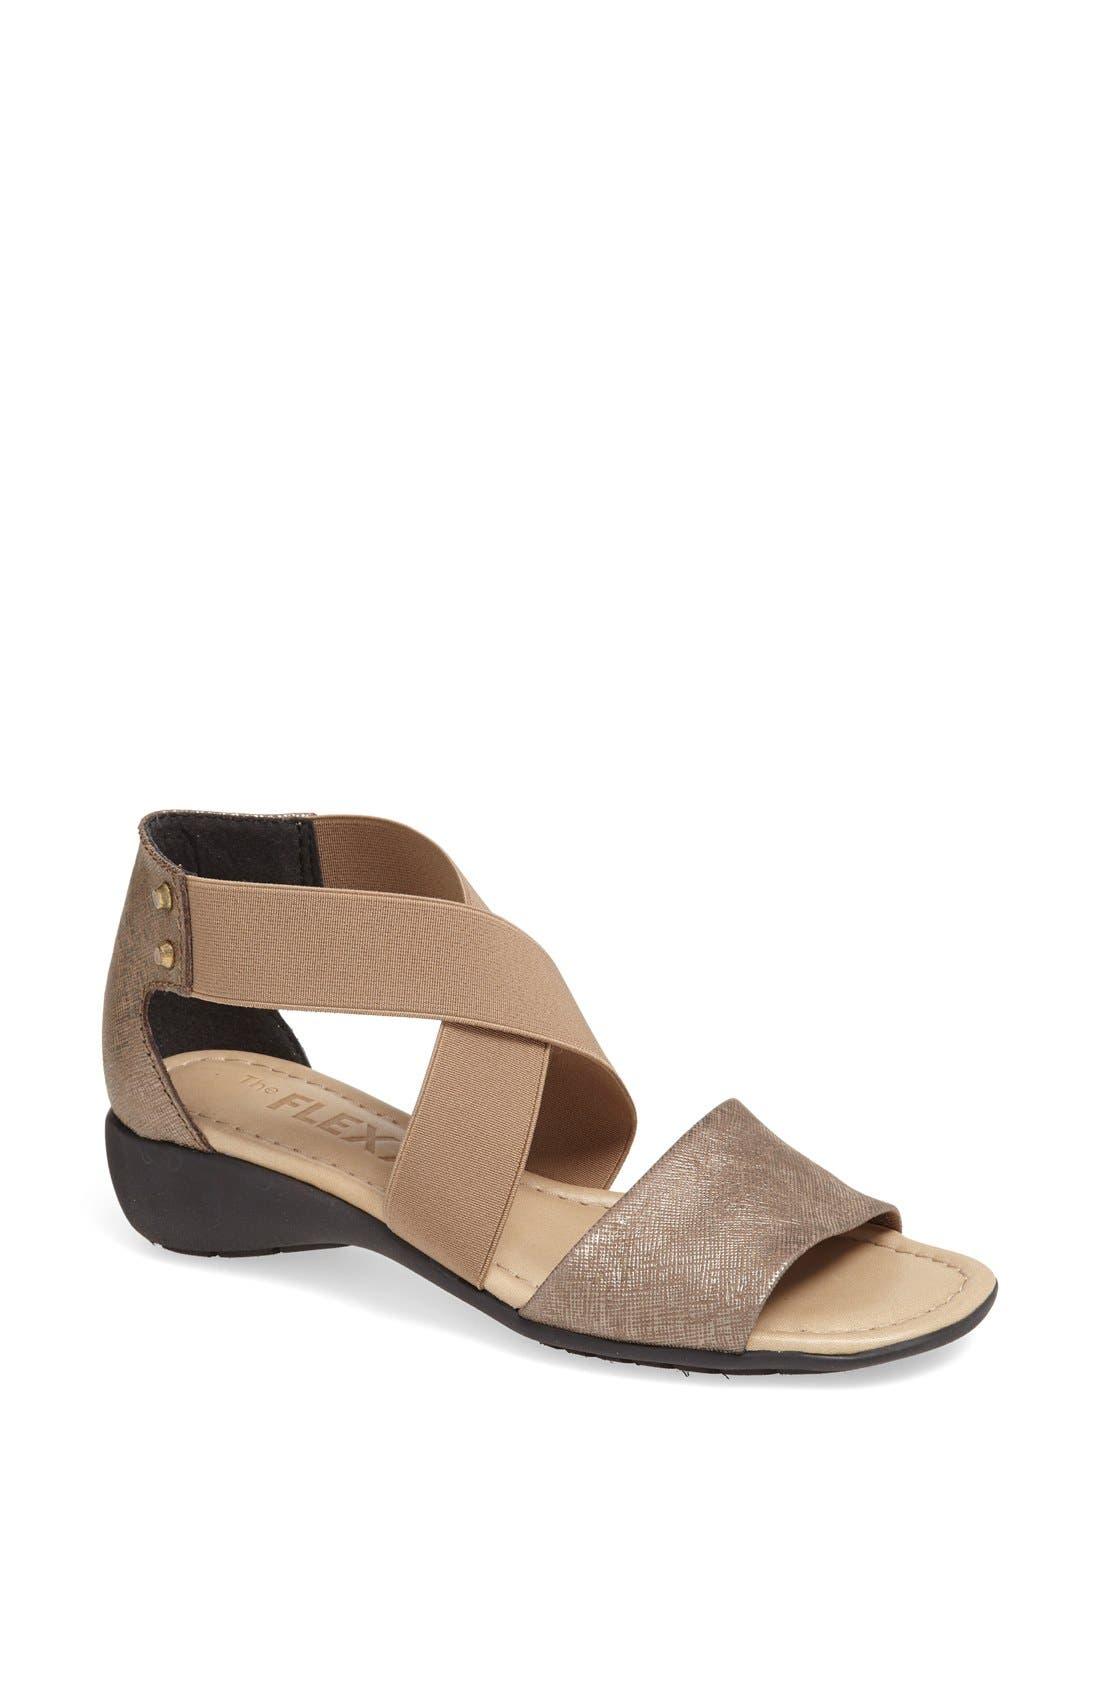 Main Image - The FLEXX 'Sunglass' Leather & Elastic Sandal